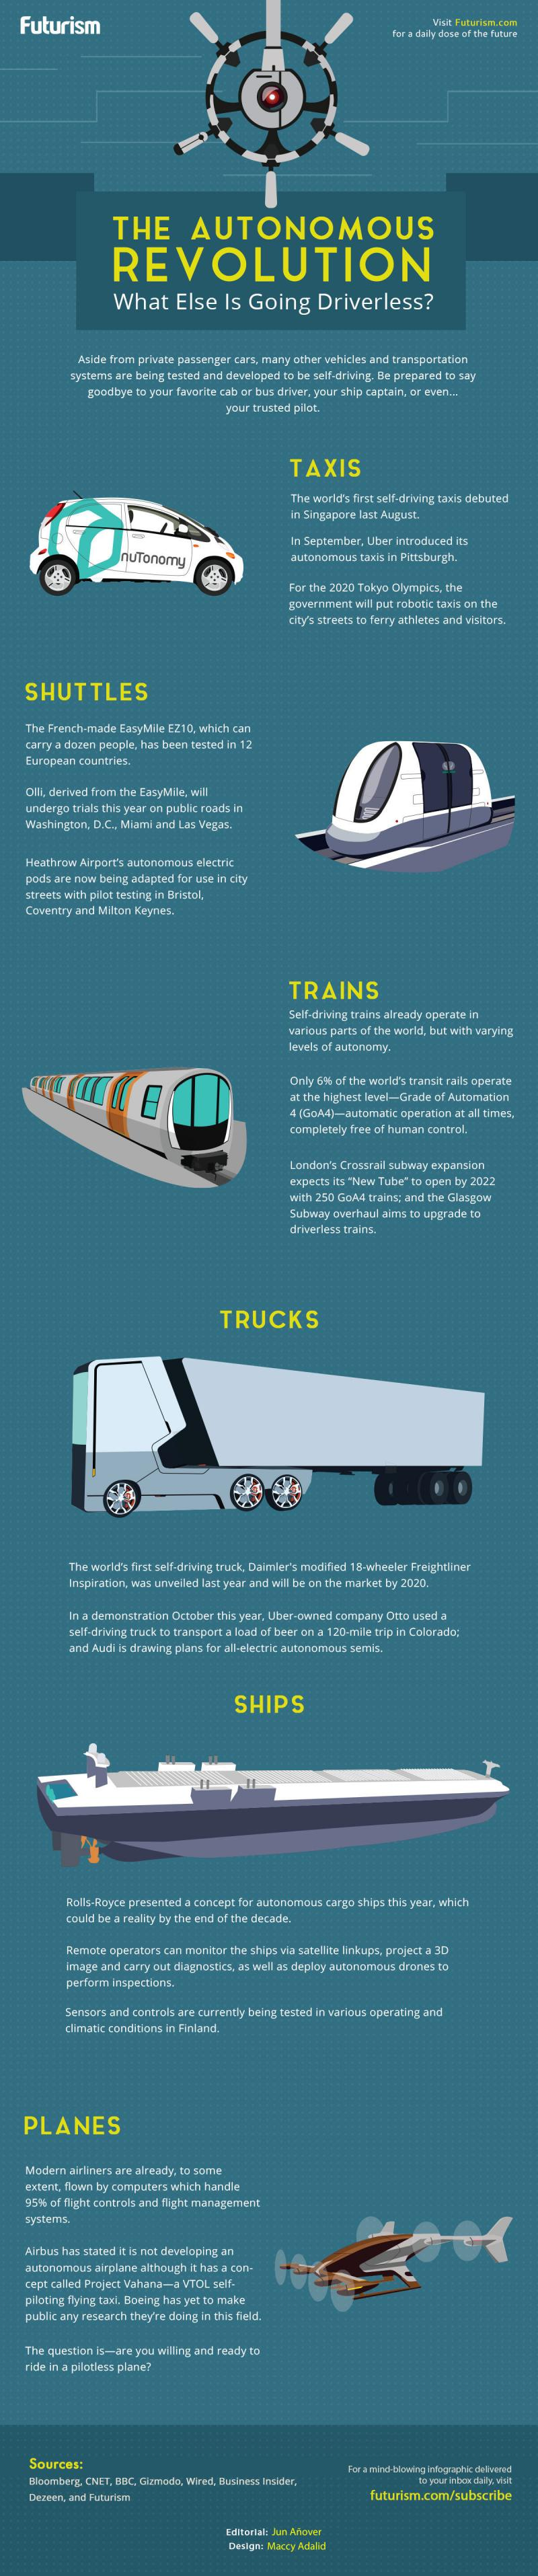 The #autonomous revolution what else is going driverless #Smart_City #IOT #infographic